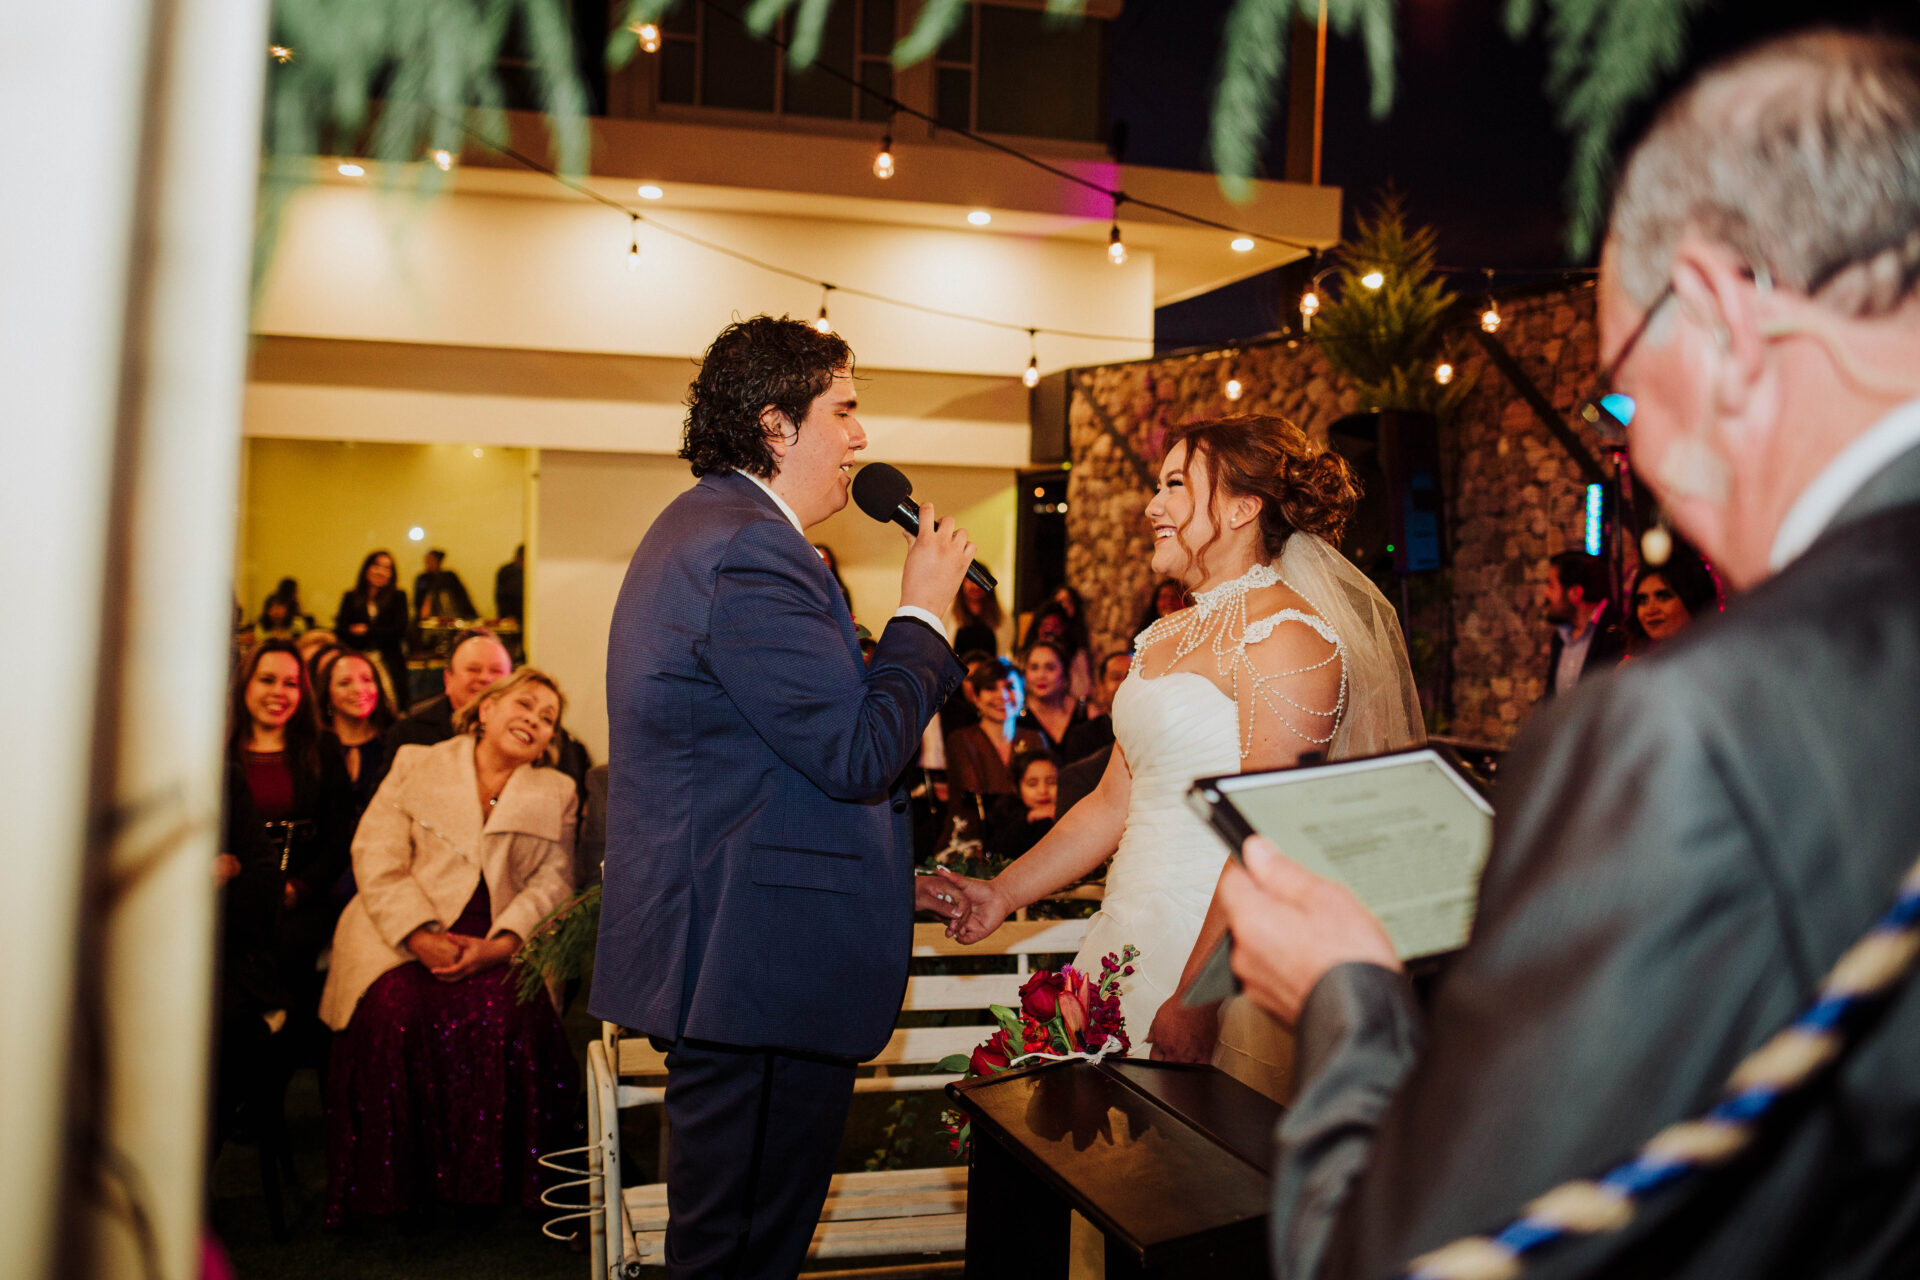 javier_noriega_fotografo_bodas_gaviones_zacatecas_wedding_photographer27